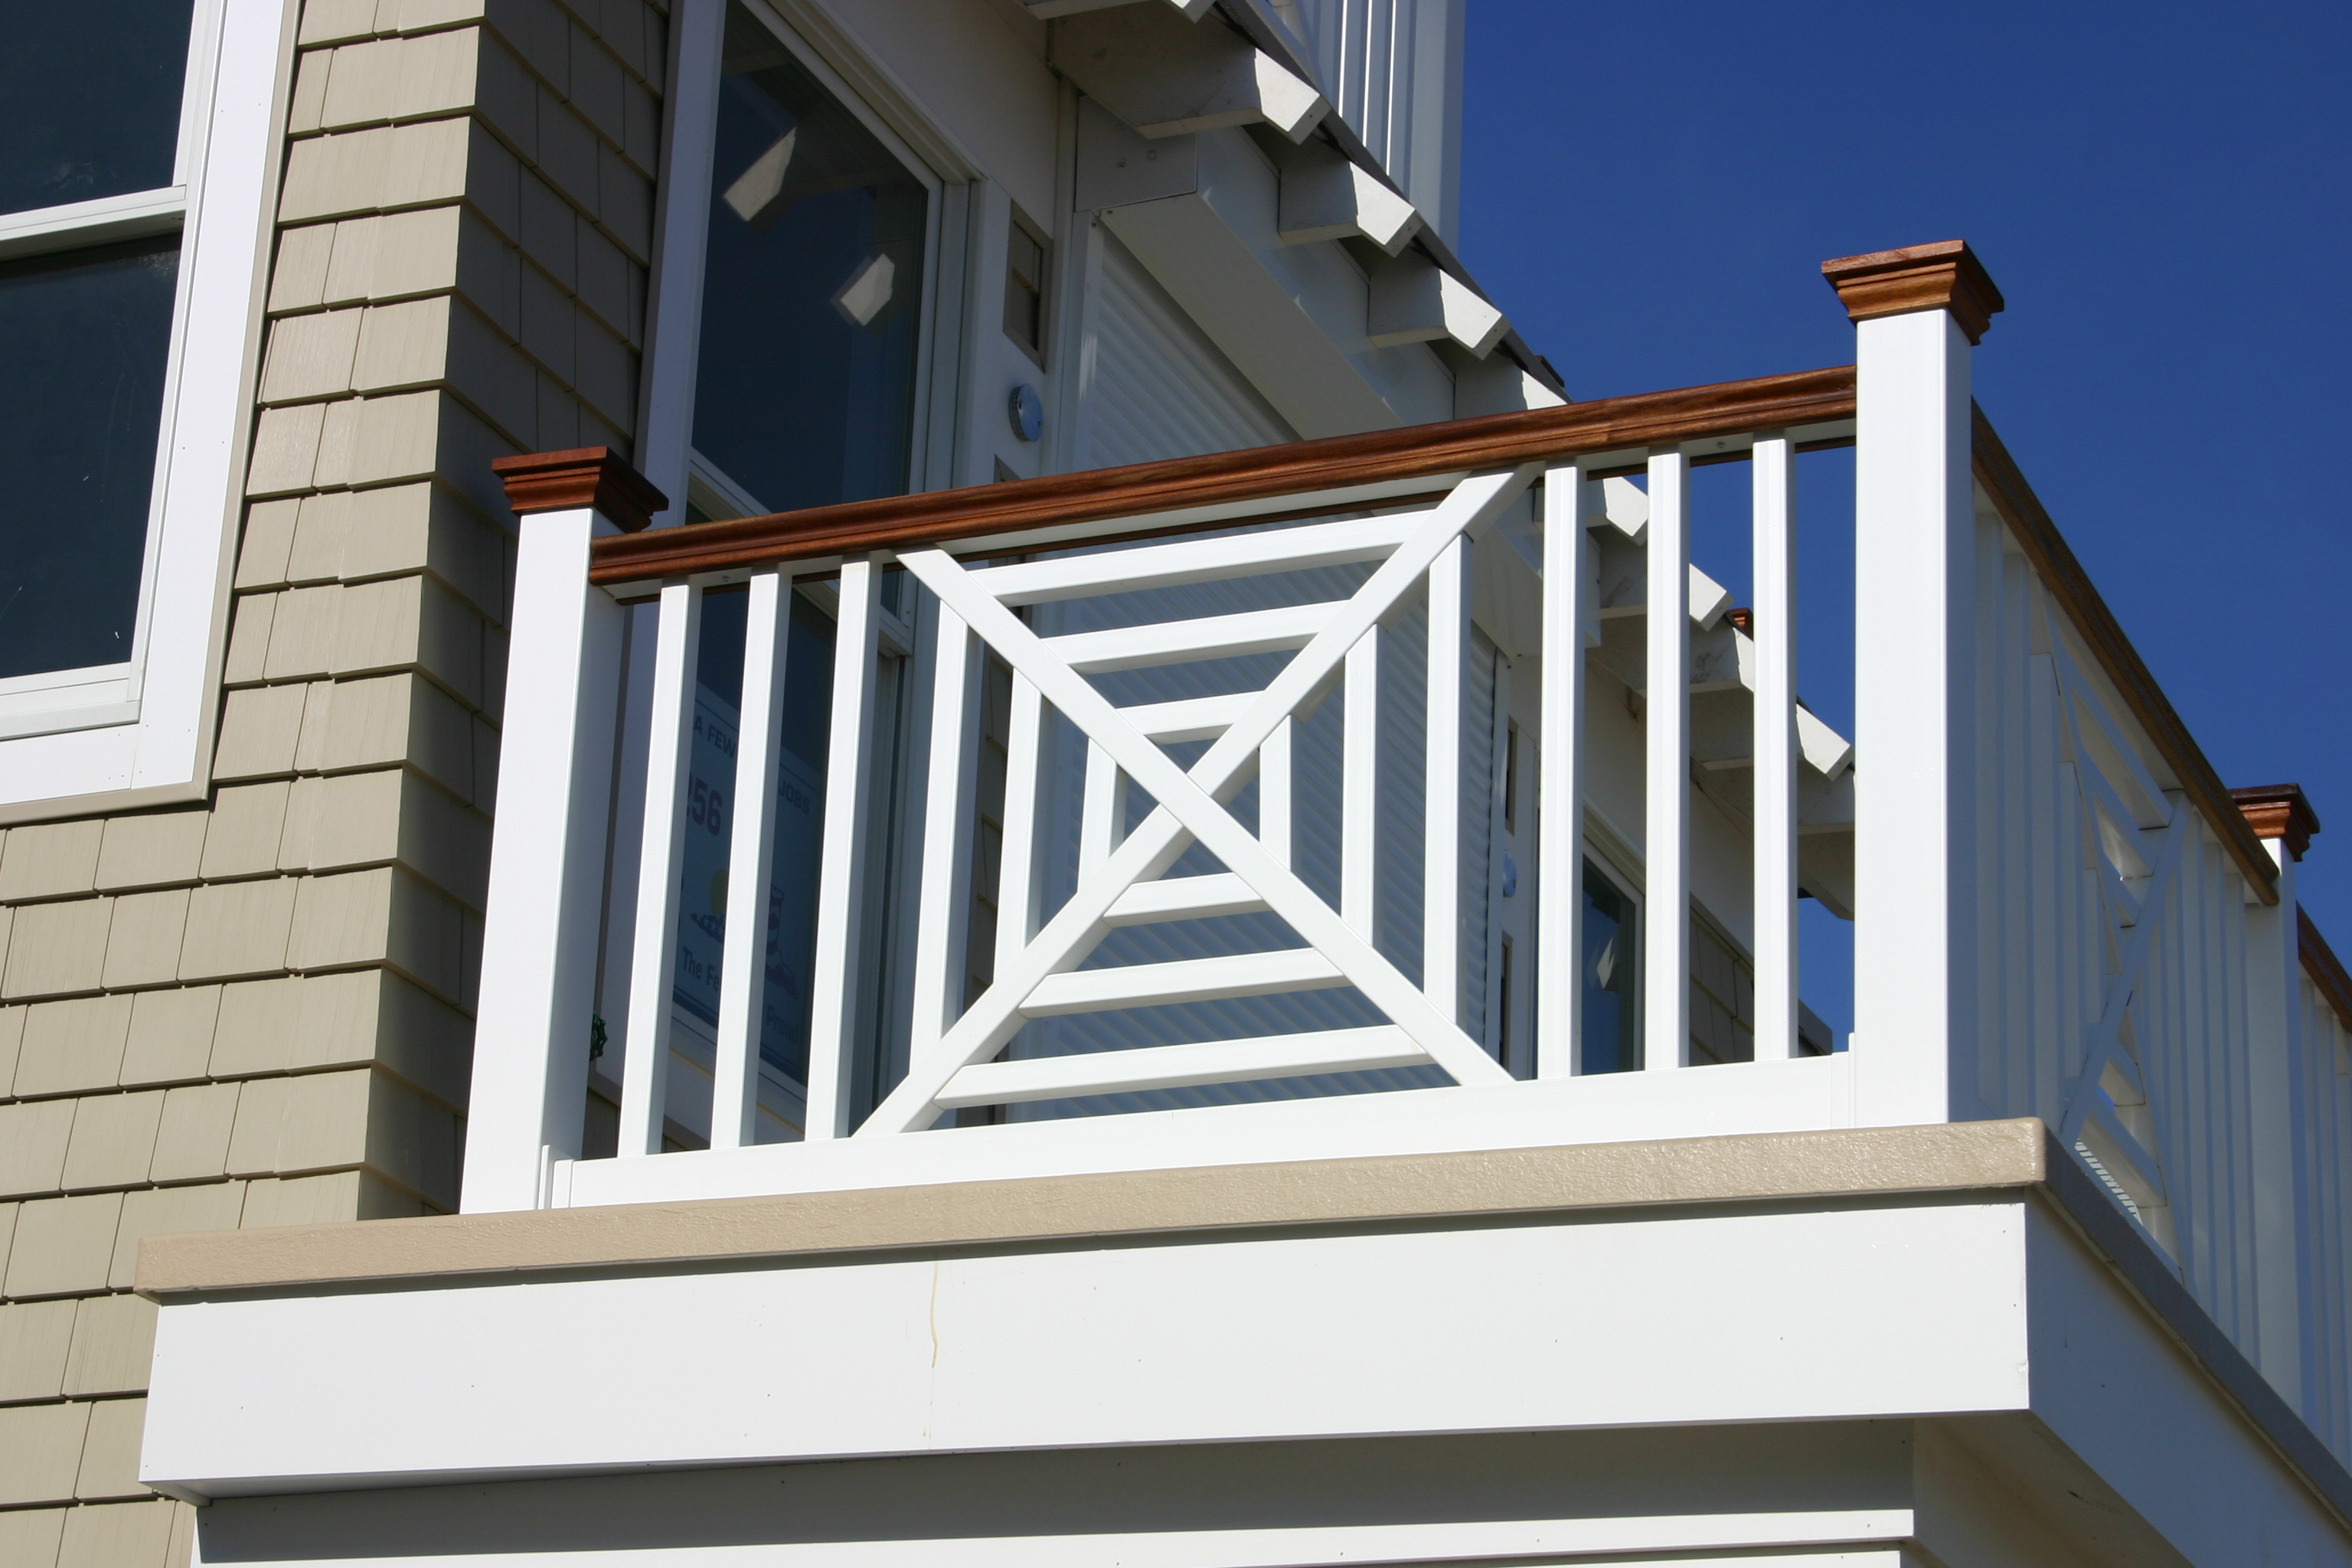 Phoenix PVC Railings Designer Series